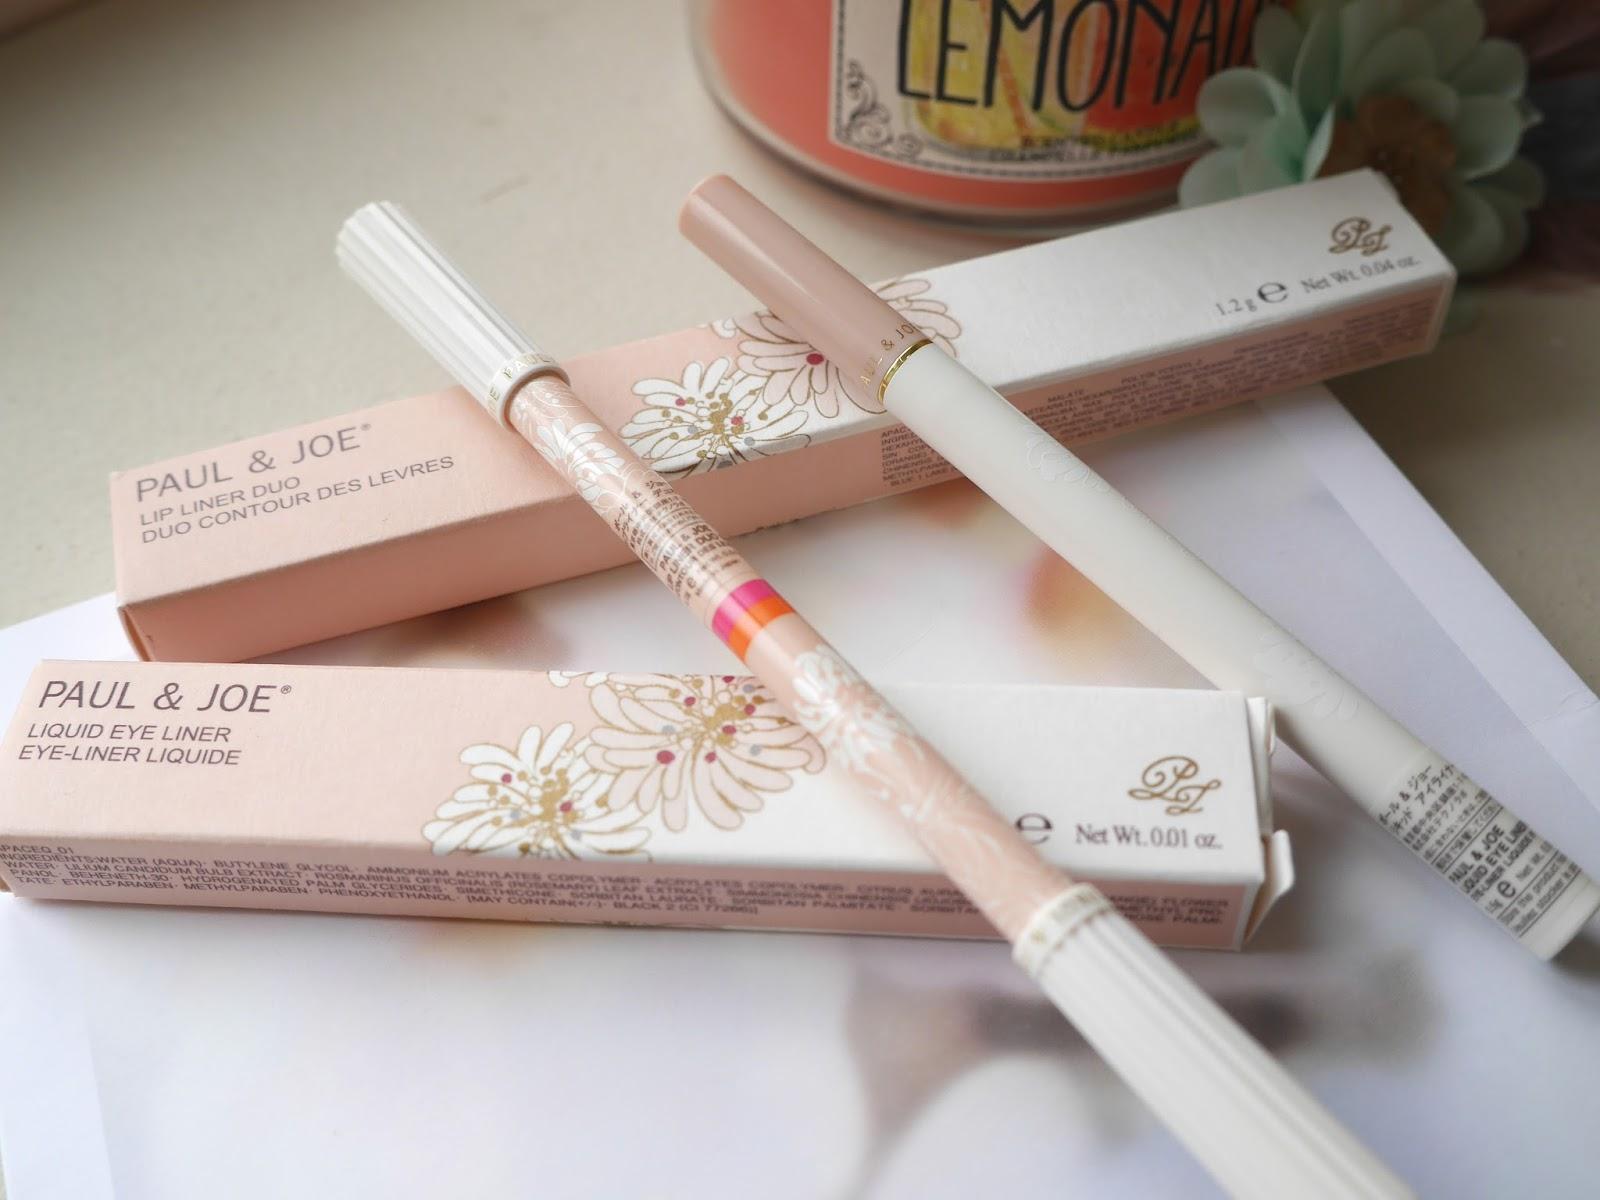 paul & joe liquid eyeliner lip liner duo 4 review swatch